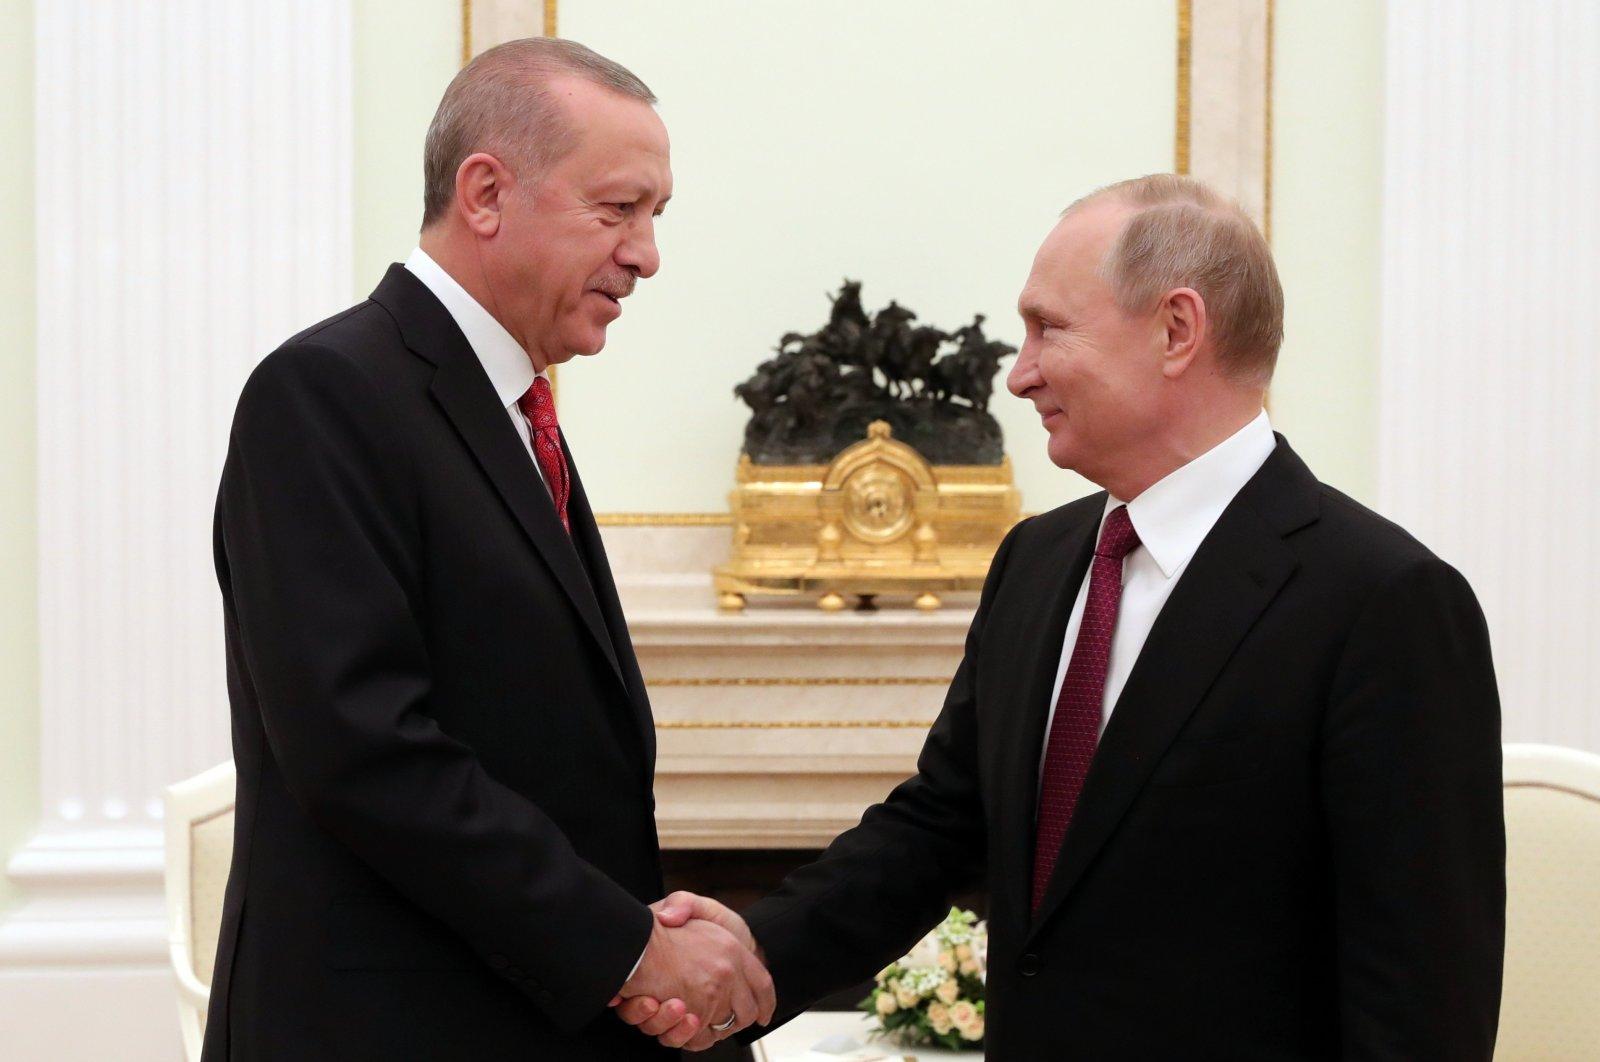 President Recep Tayyip Erdoğan (L) shakes hands with Russian President Vladimir Putin prior to their talks at the Kremlin in Moscow, Jan. 23, 2019. (AP)